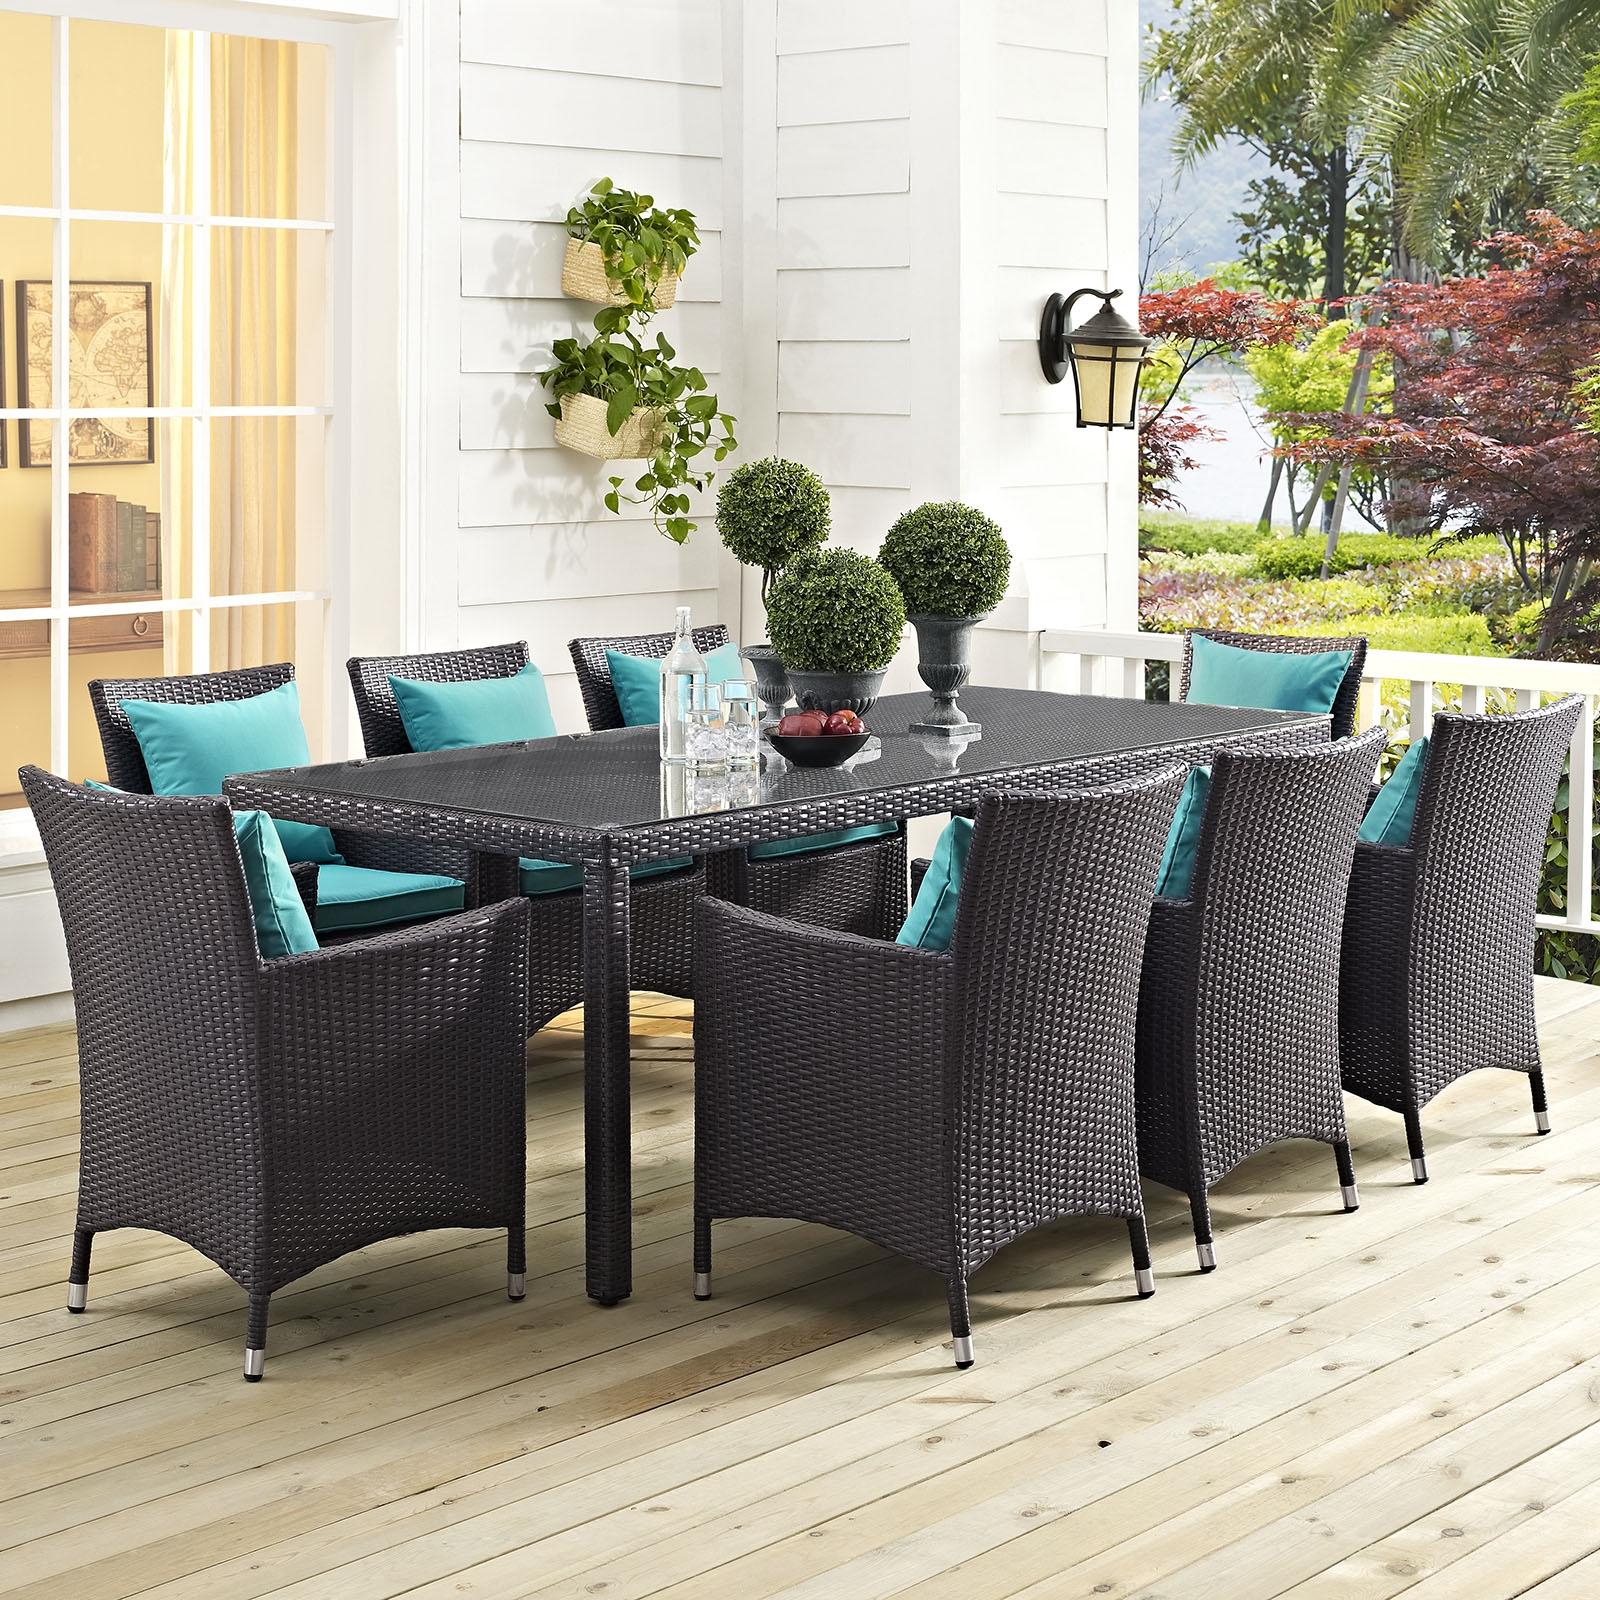 Convene 9 Piece Outdoor Patio Dining Set in Espresso Turquoise